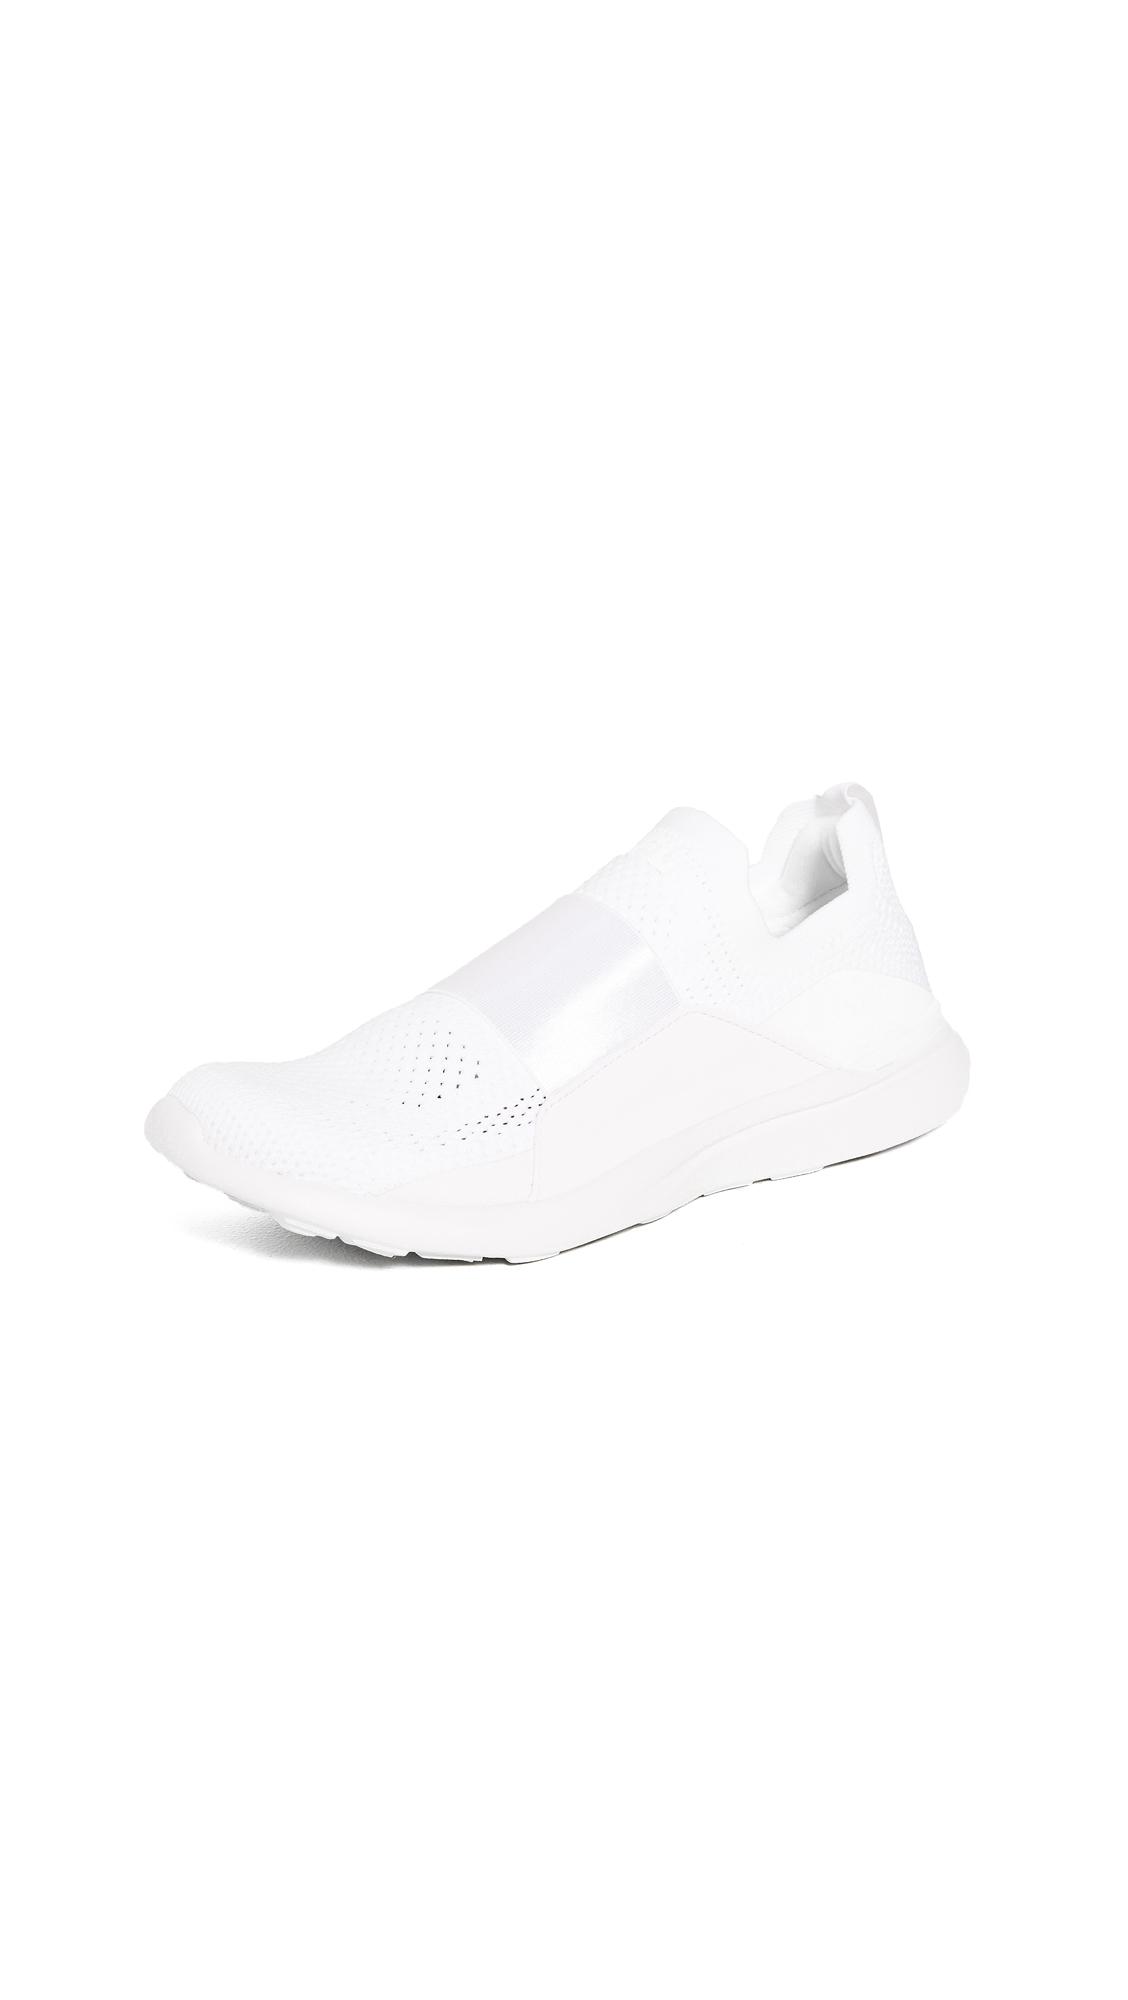 Buy APL: Athletic Propulsion Labs online - photo of APL: Athletic Propulsion Labs TechLoom Bliss Sneakers